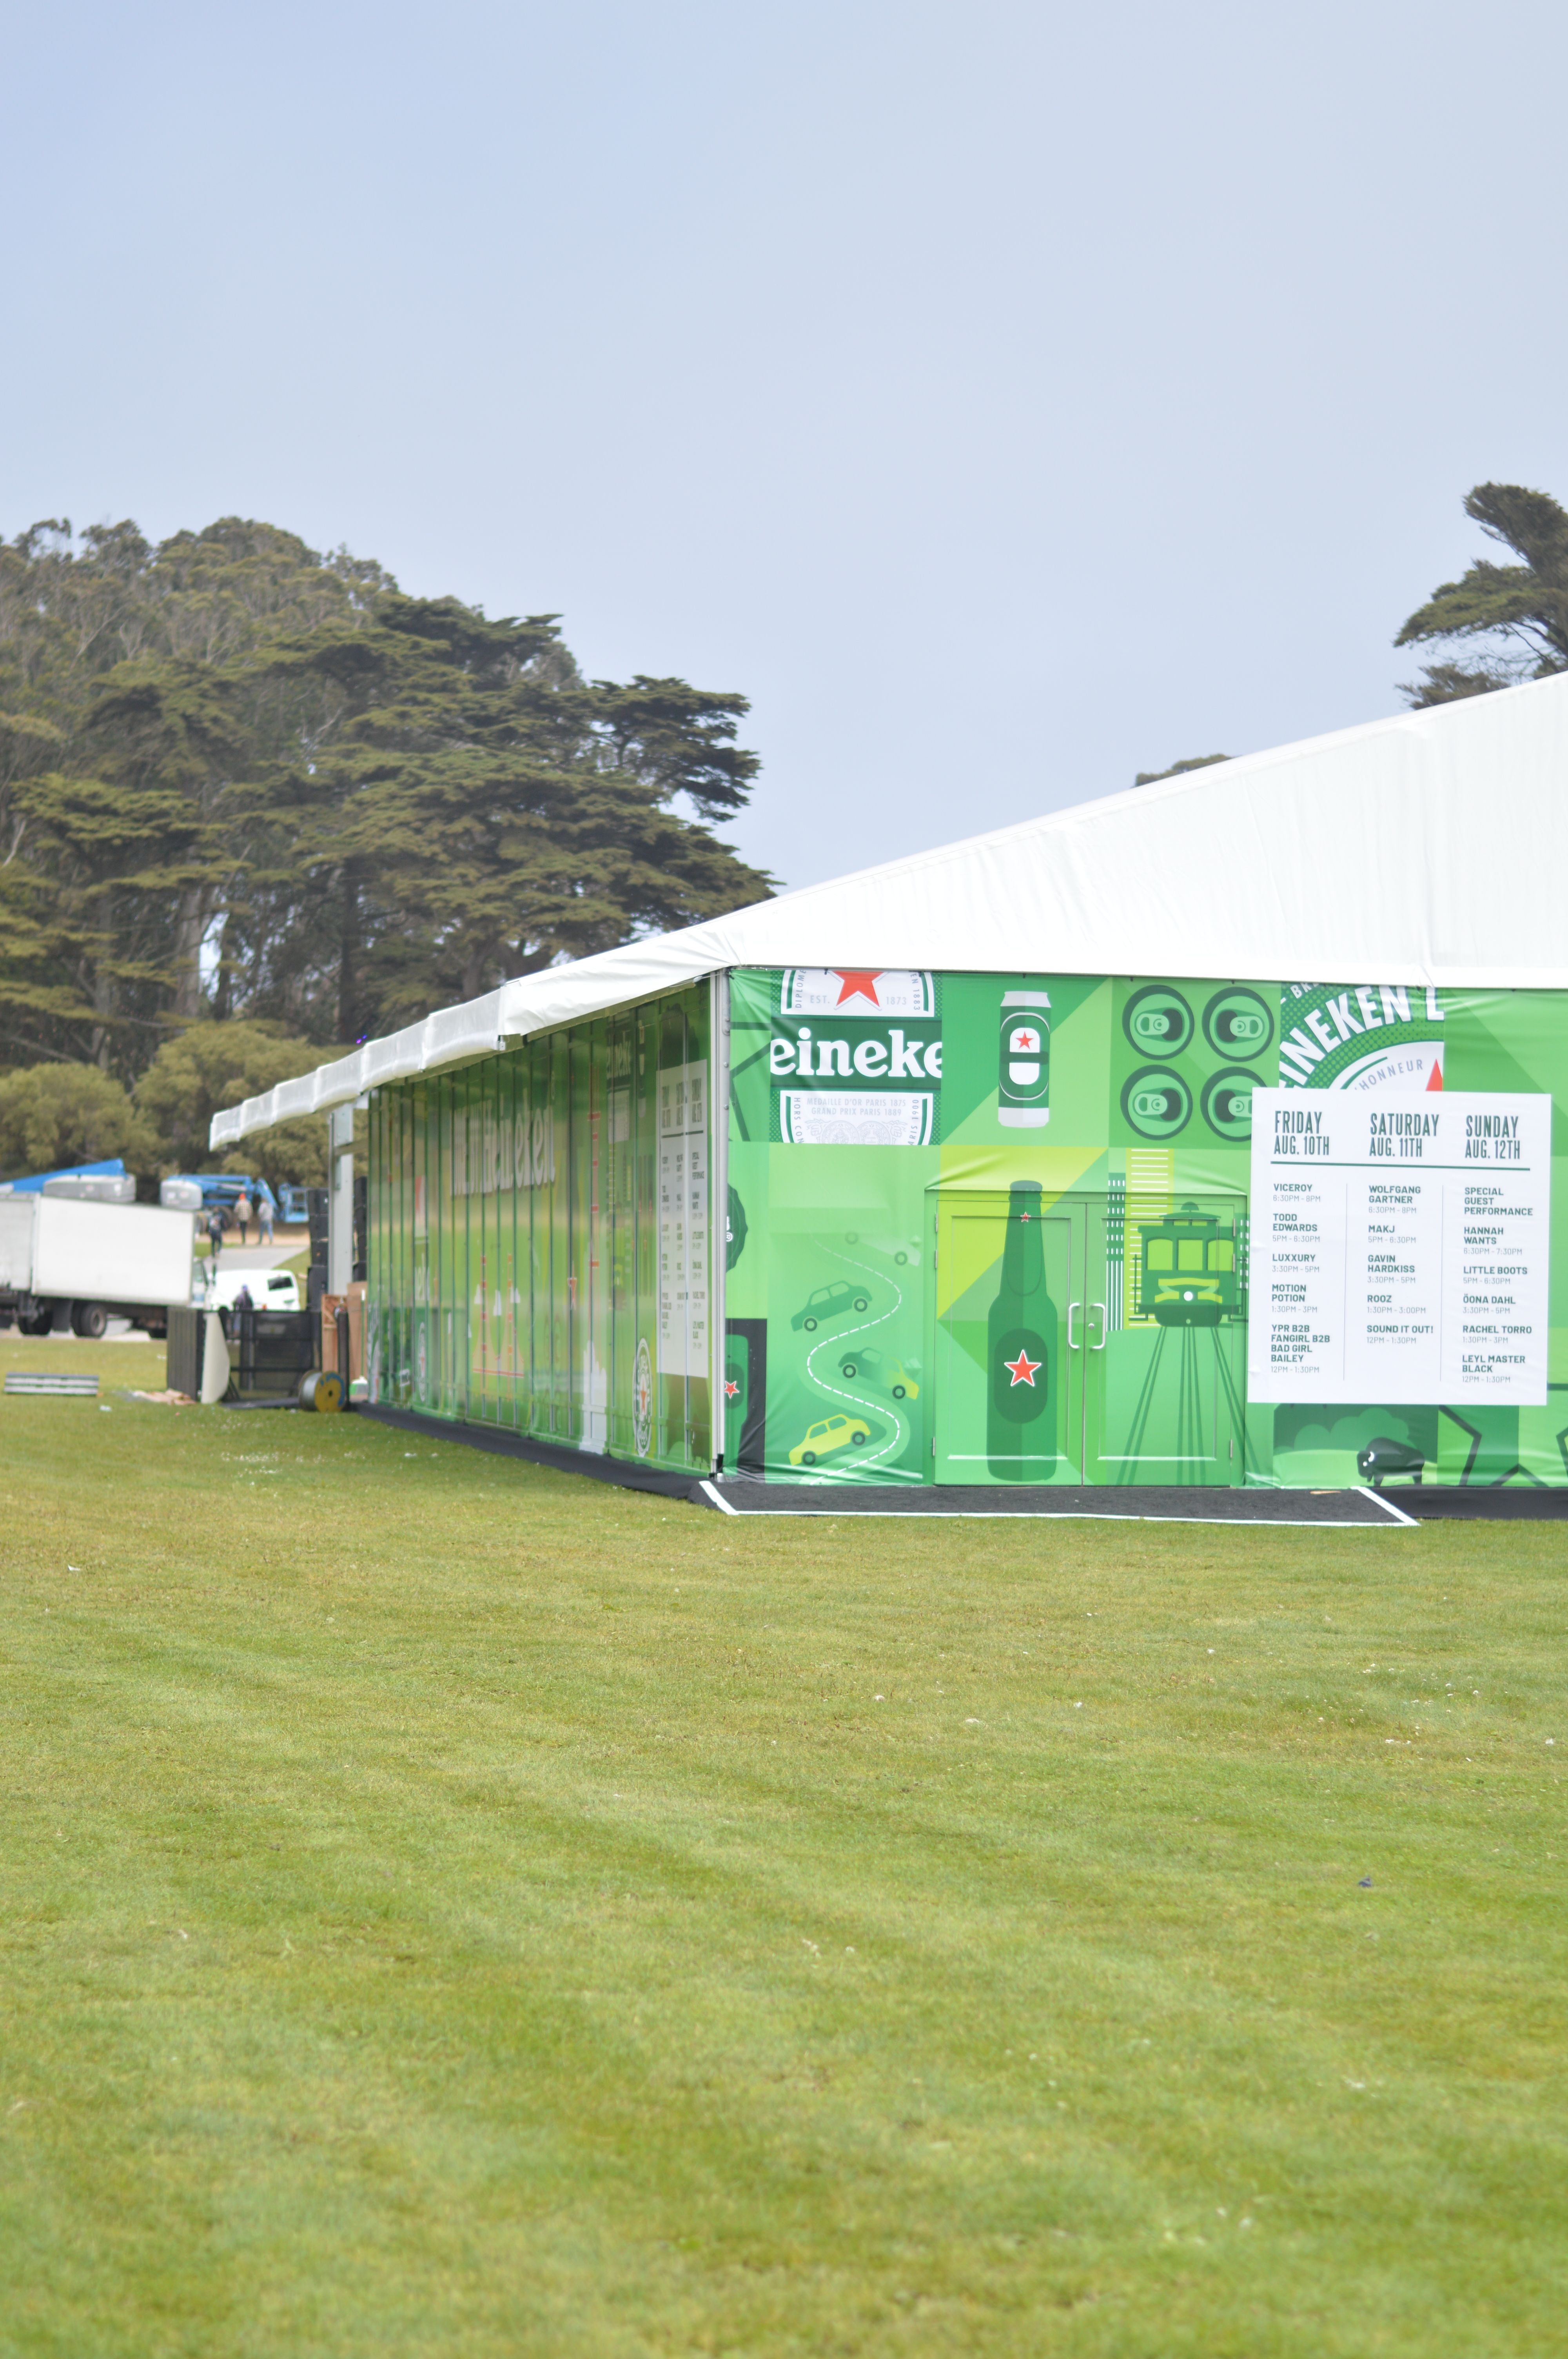 Abbey party rents sf arcum tent set up for heineken house